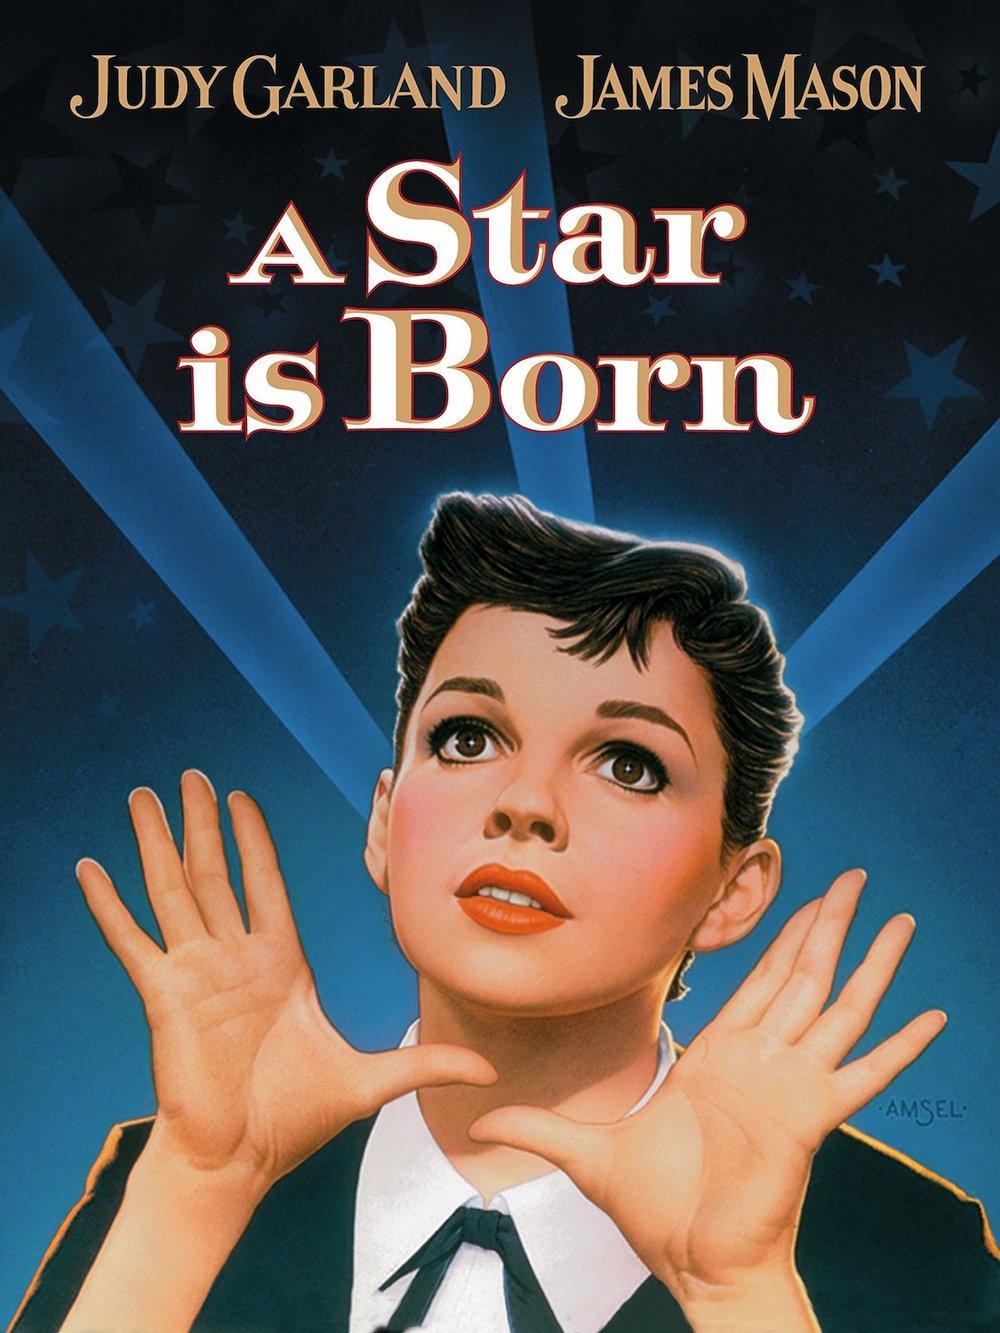 AStarIsBorn1954.jpg